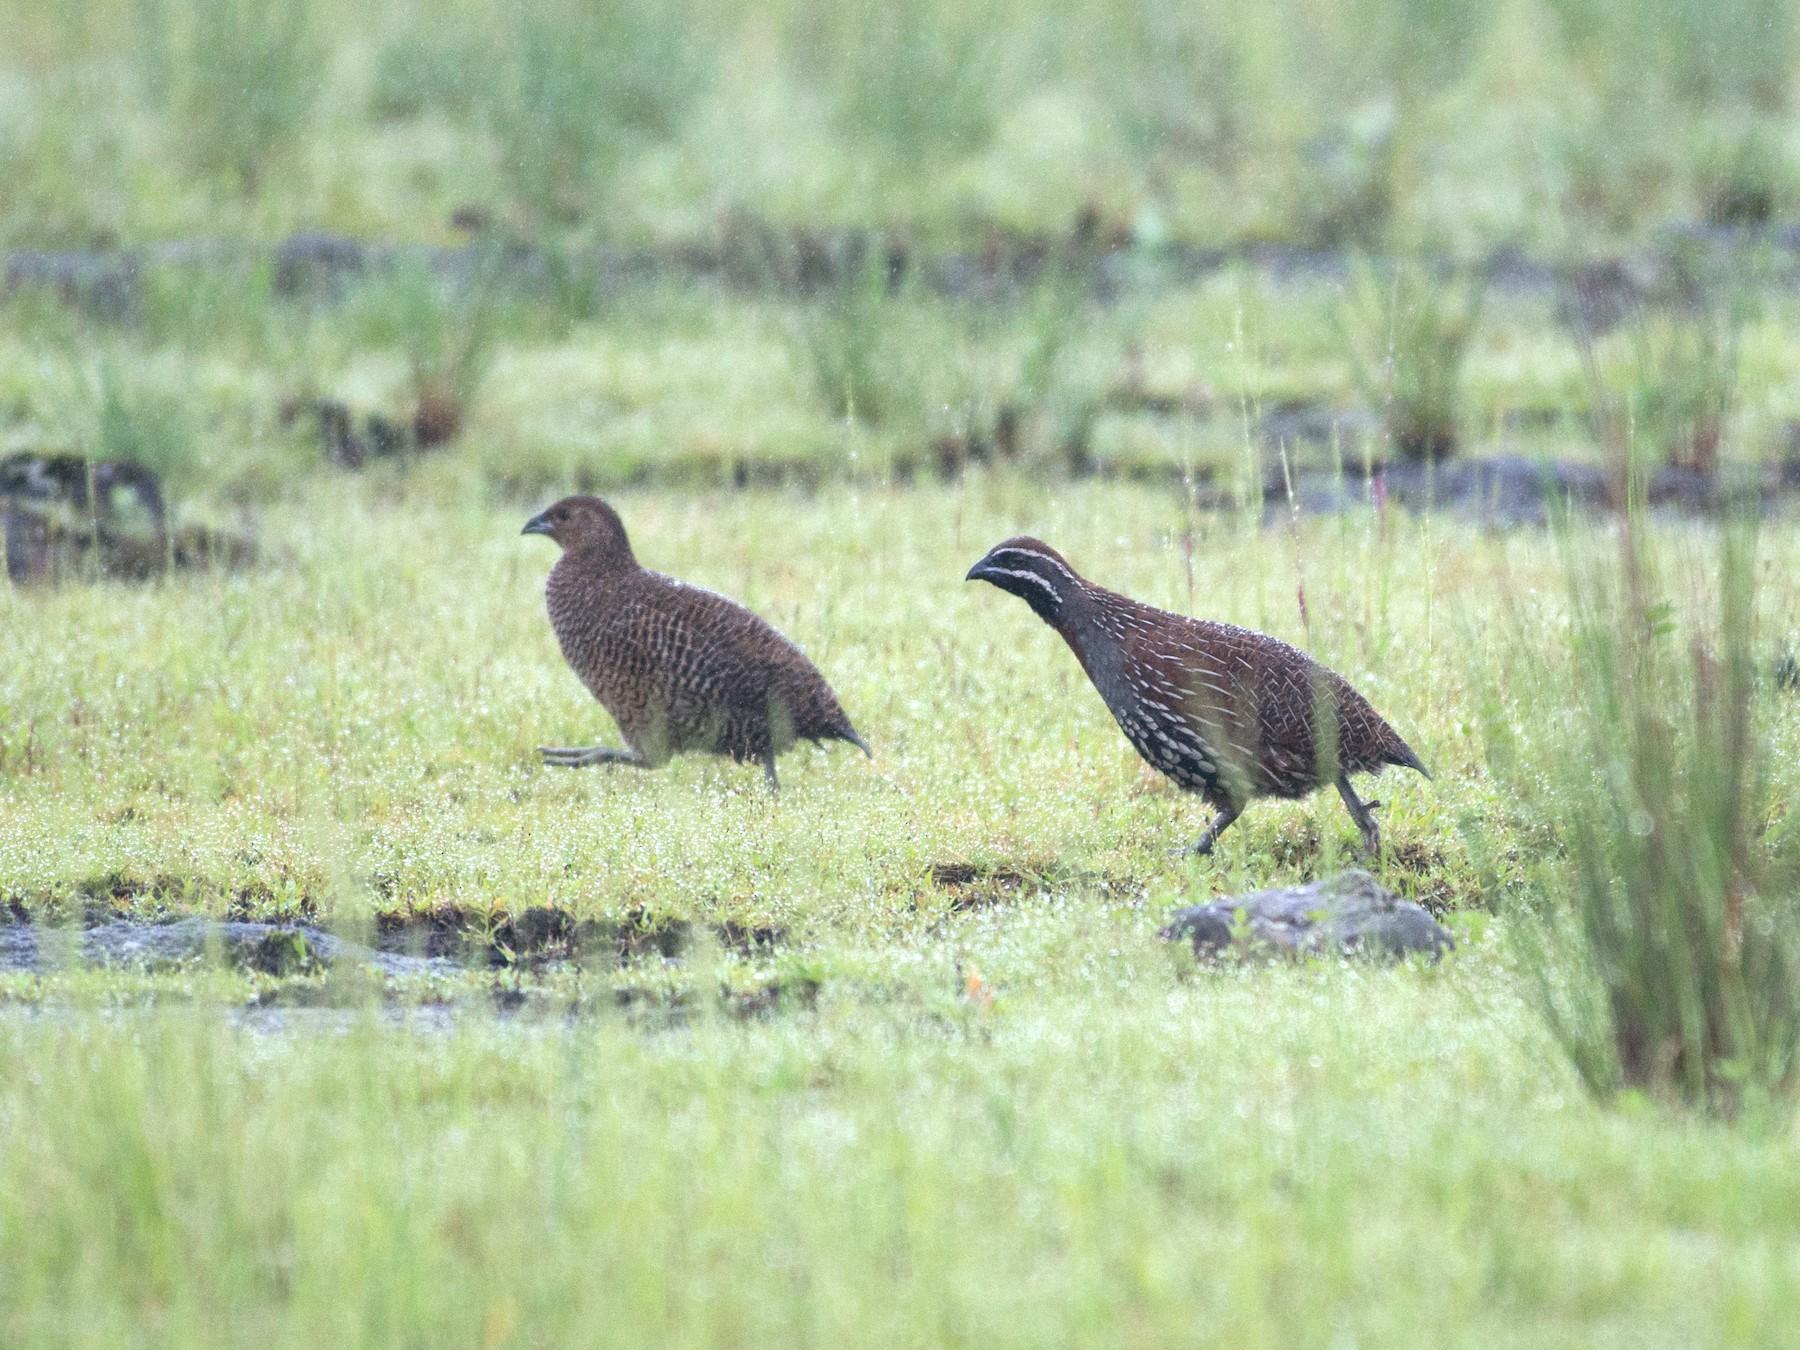 Madagascar Partridge - John C. Mittermeier